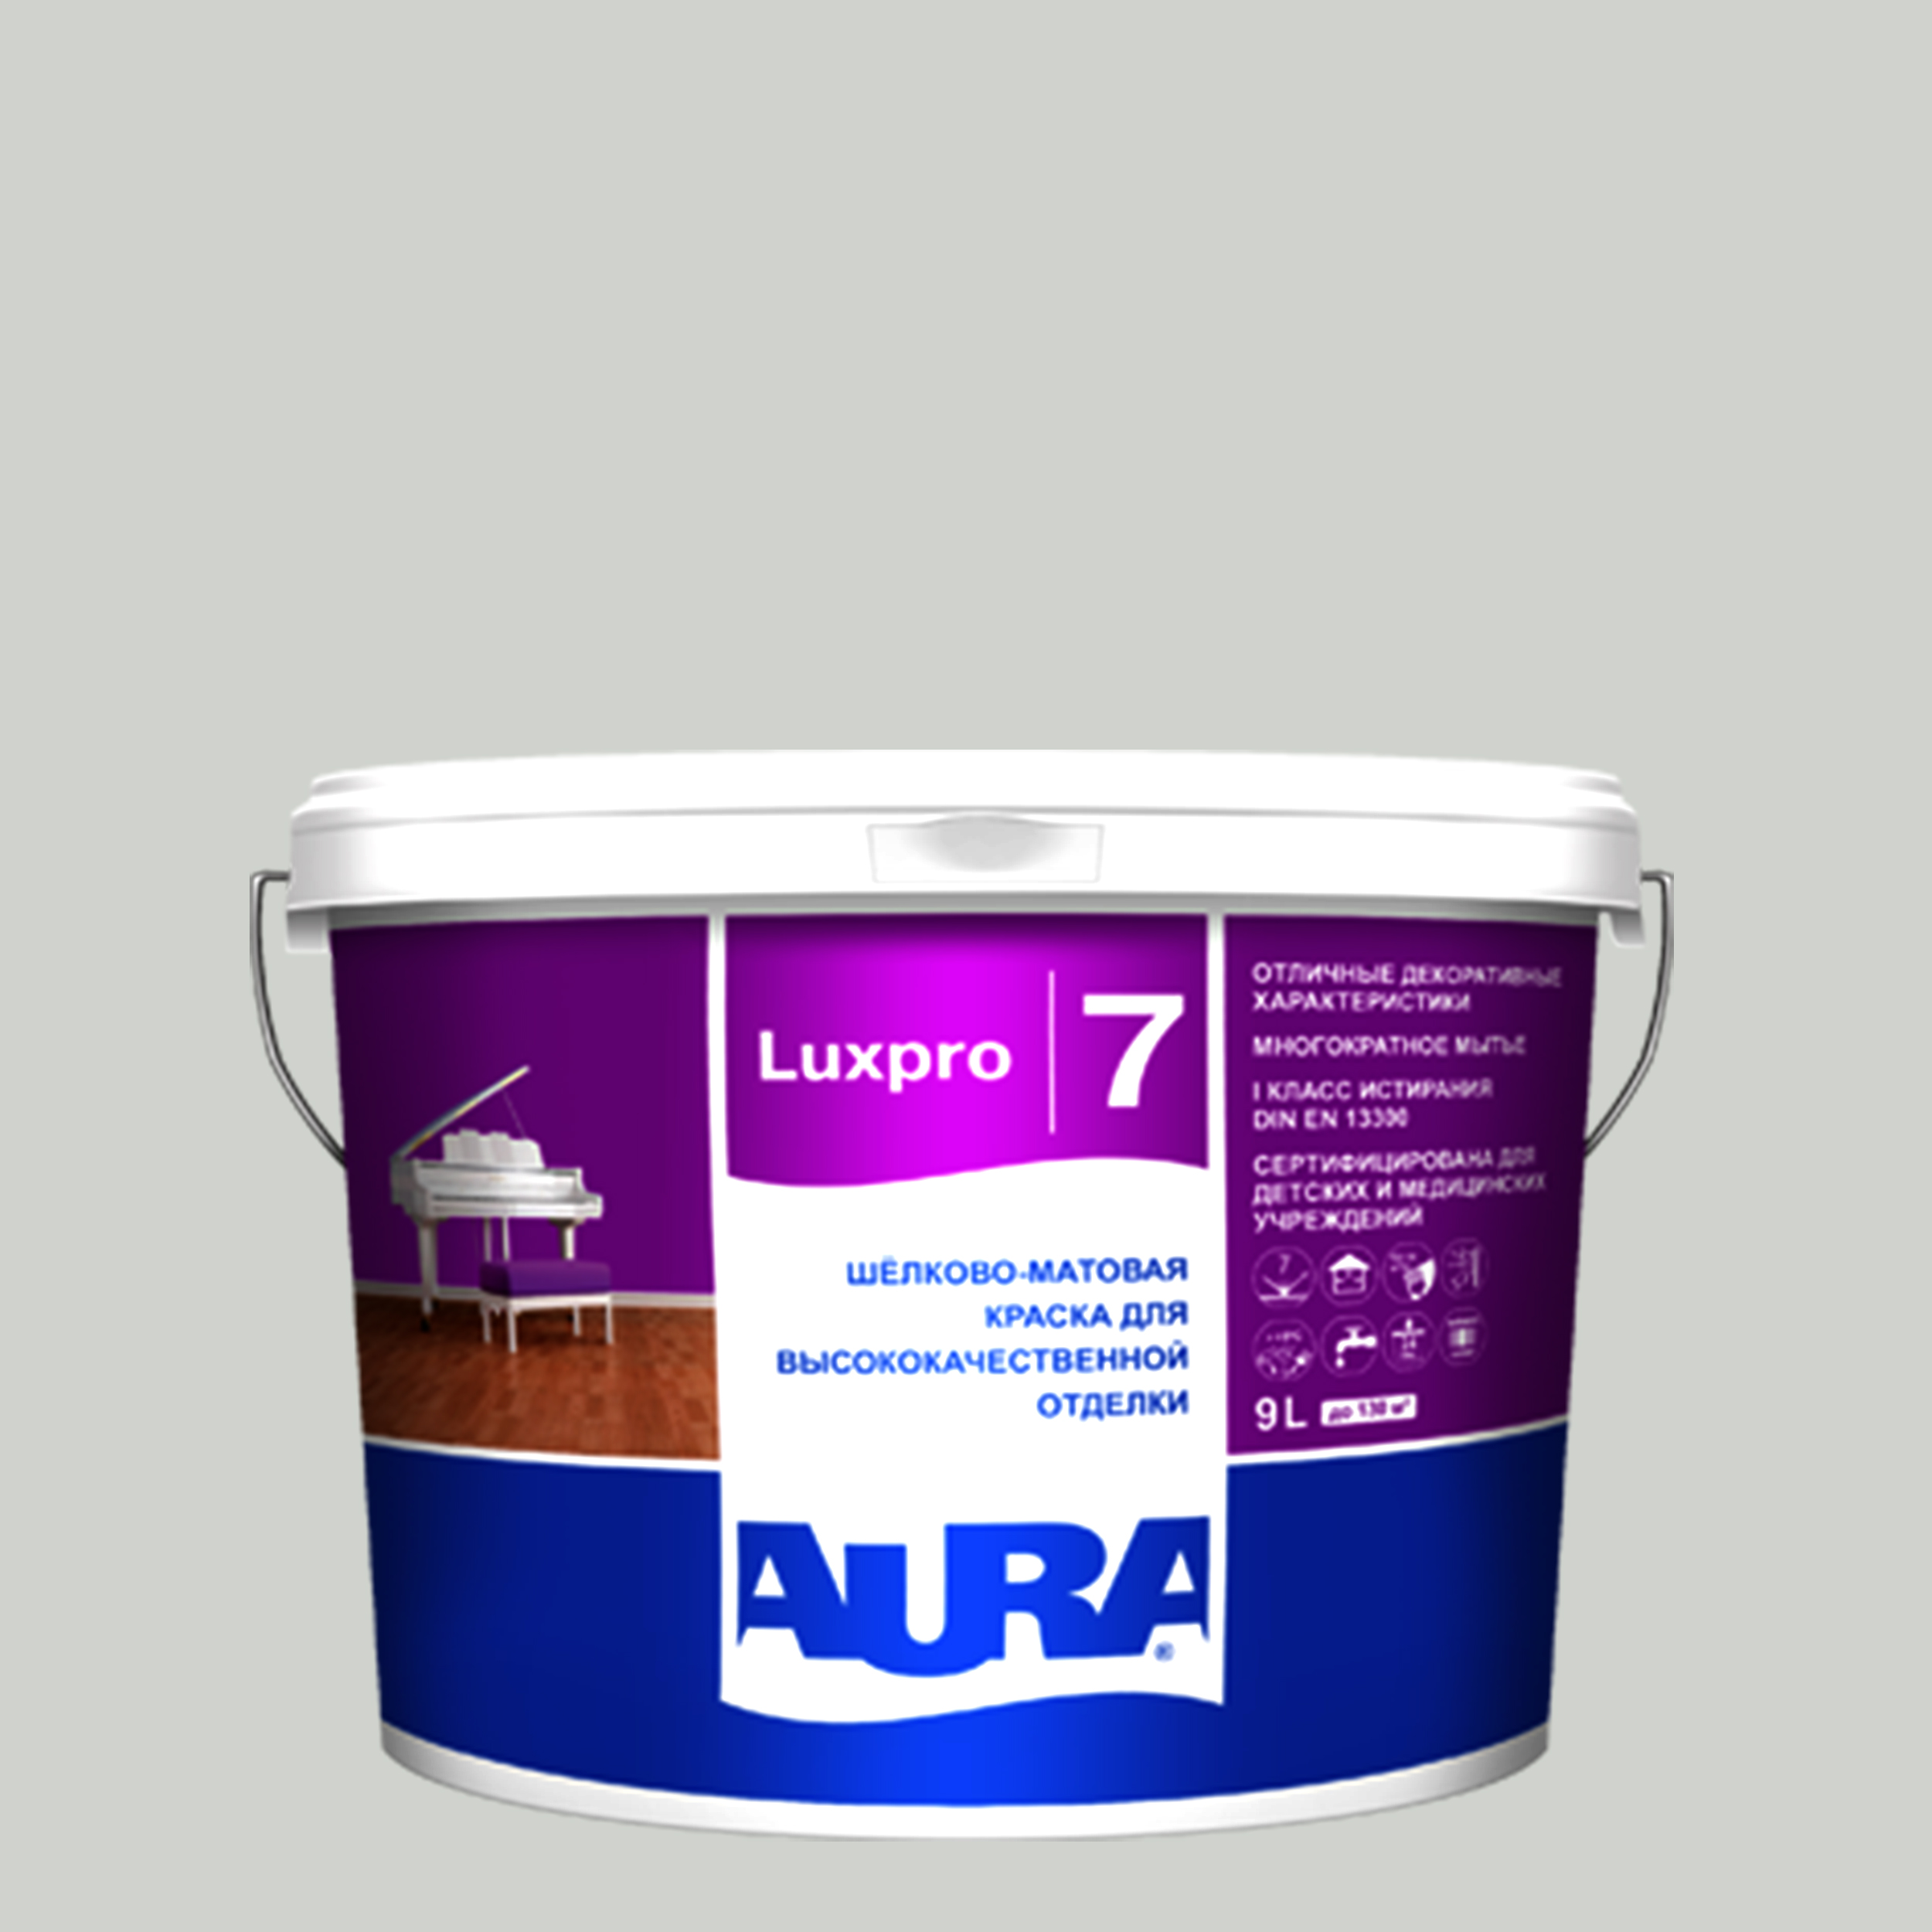 Фото 5 - Краска интерьерная, Aura LuxPRO 7, RAL 8012, 11 кг.